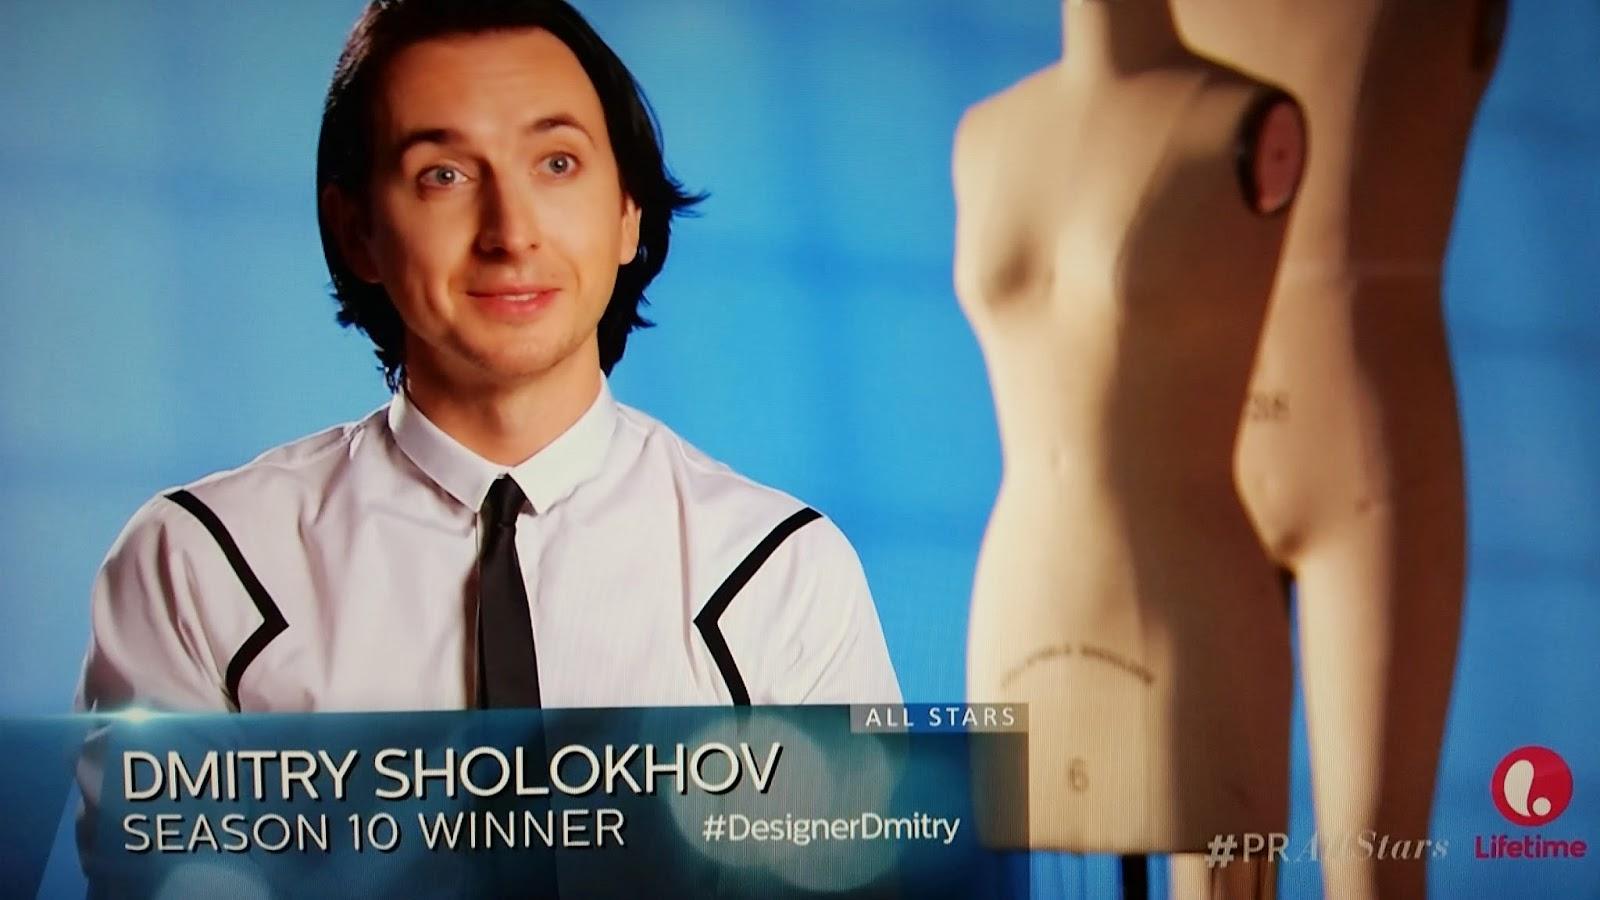 Dmitry Sholokhov Project Runway All Stars